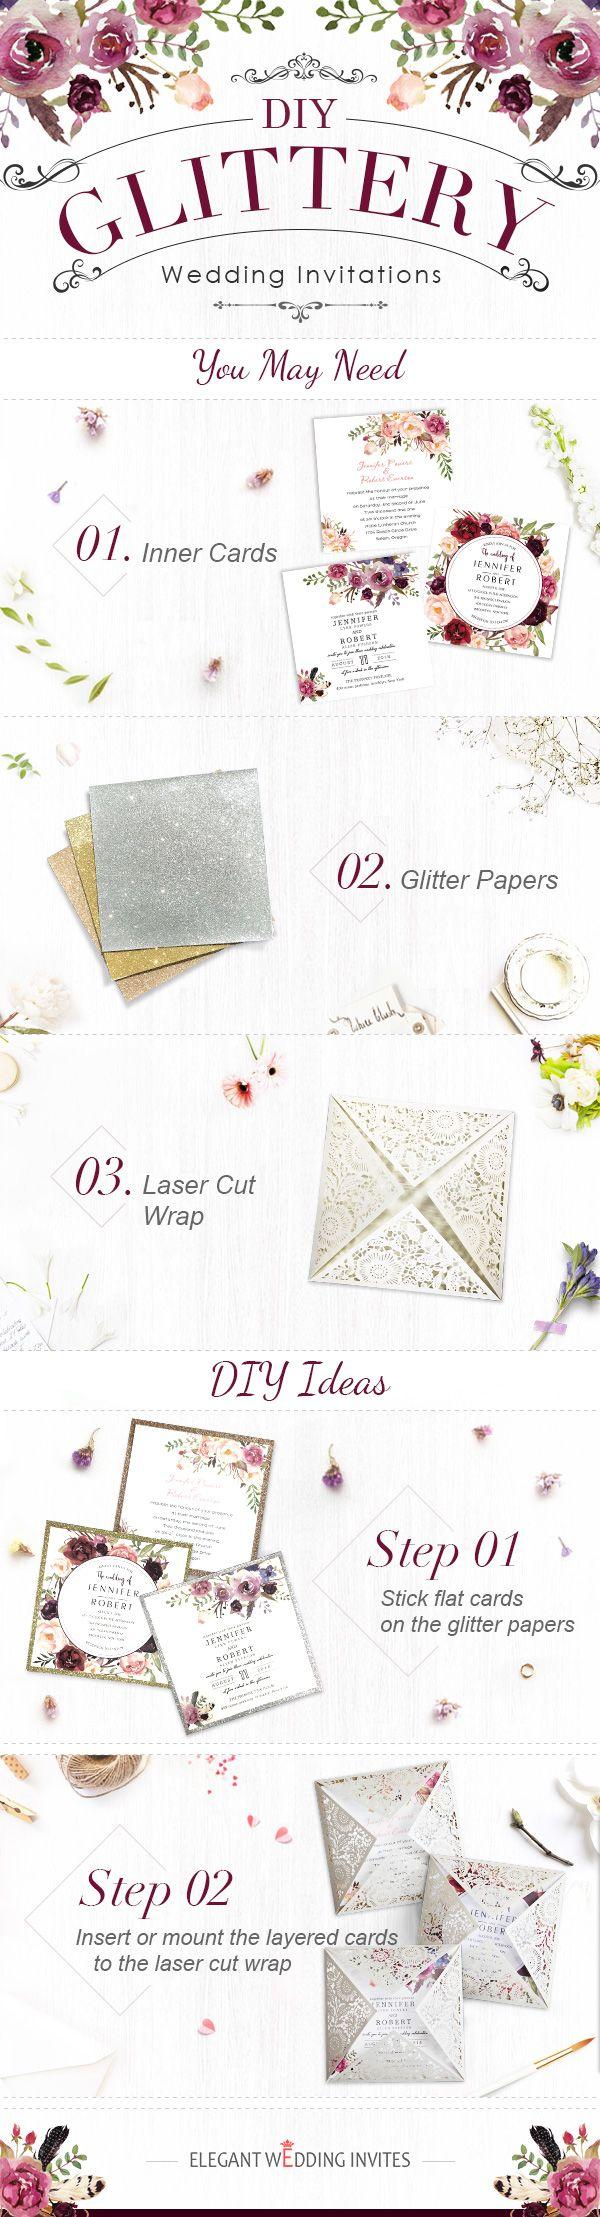 Top diy wedding invitations ideas by elegant wedding invites